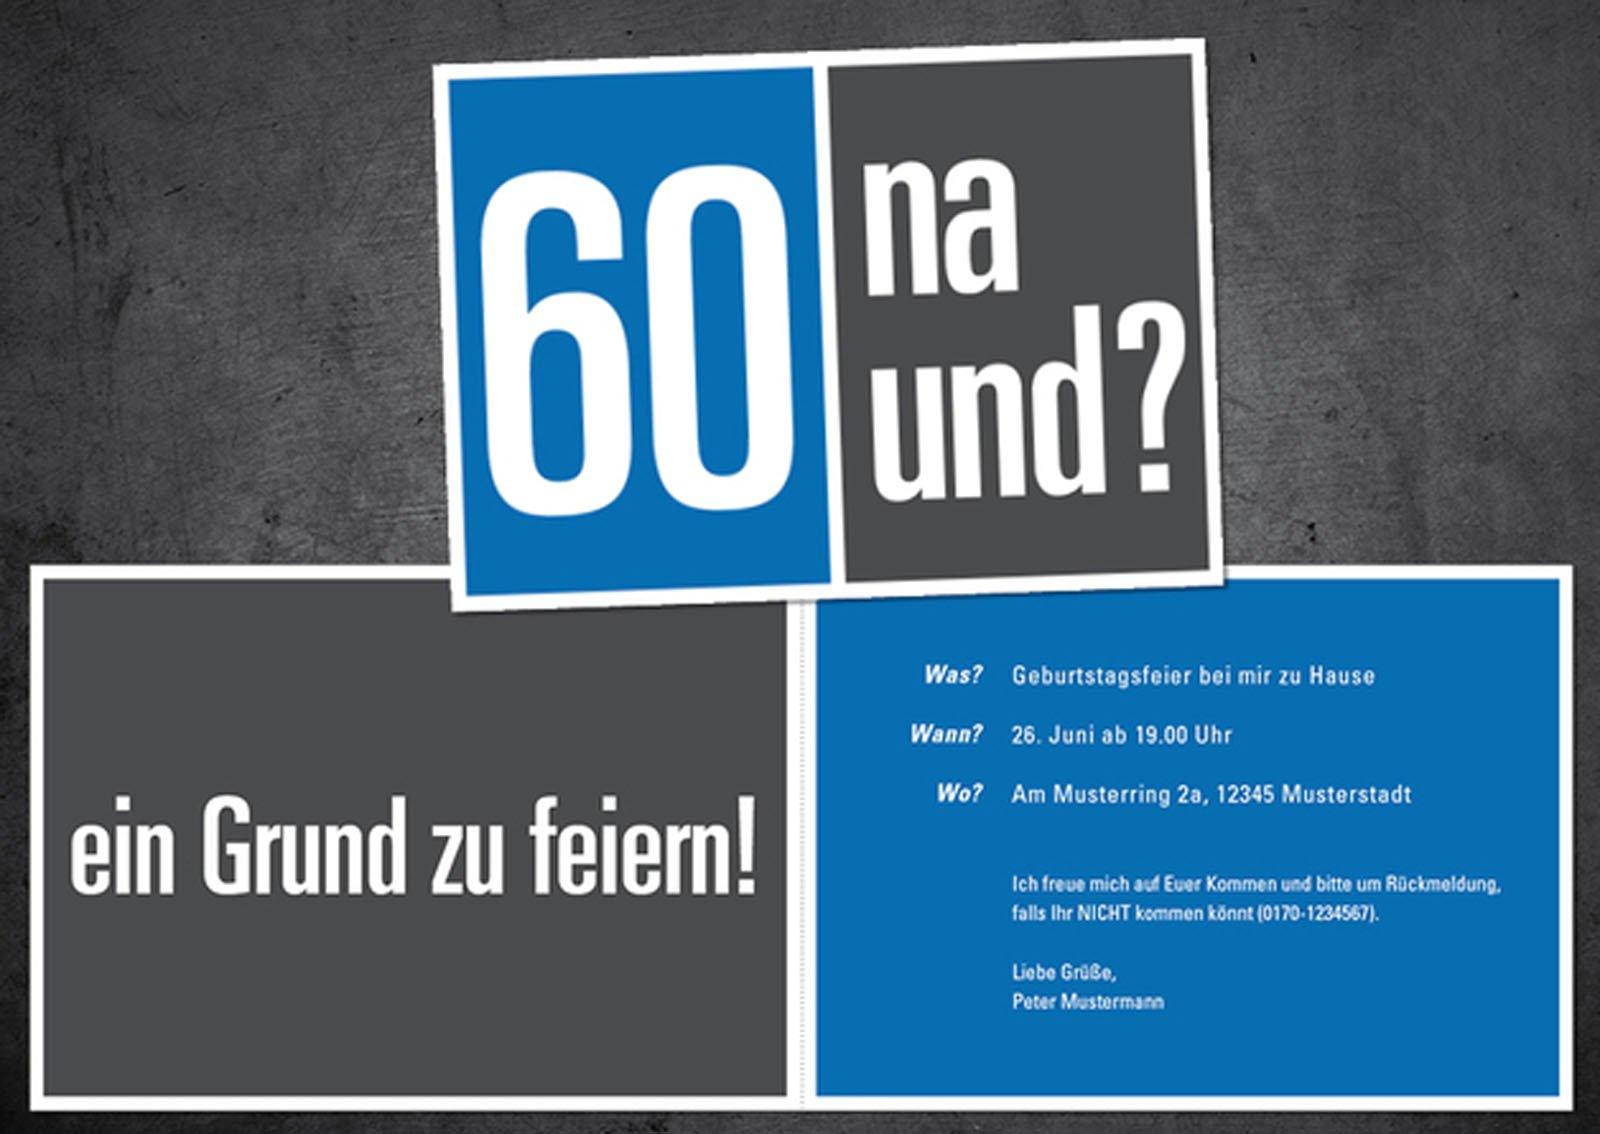 Einladung Zum 60 Geburtstag Frau: Einladung Geburtstag : Einladungen Zum 60 Geburtstag